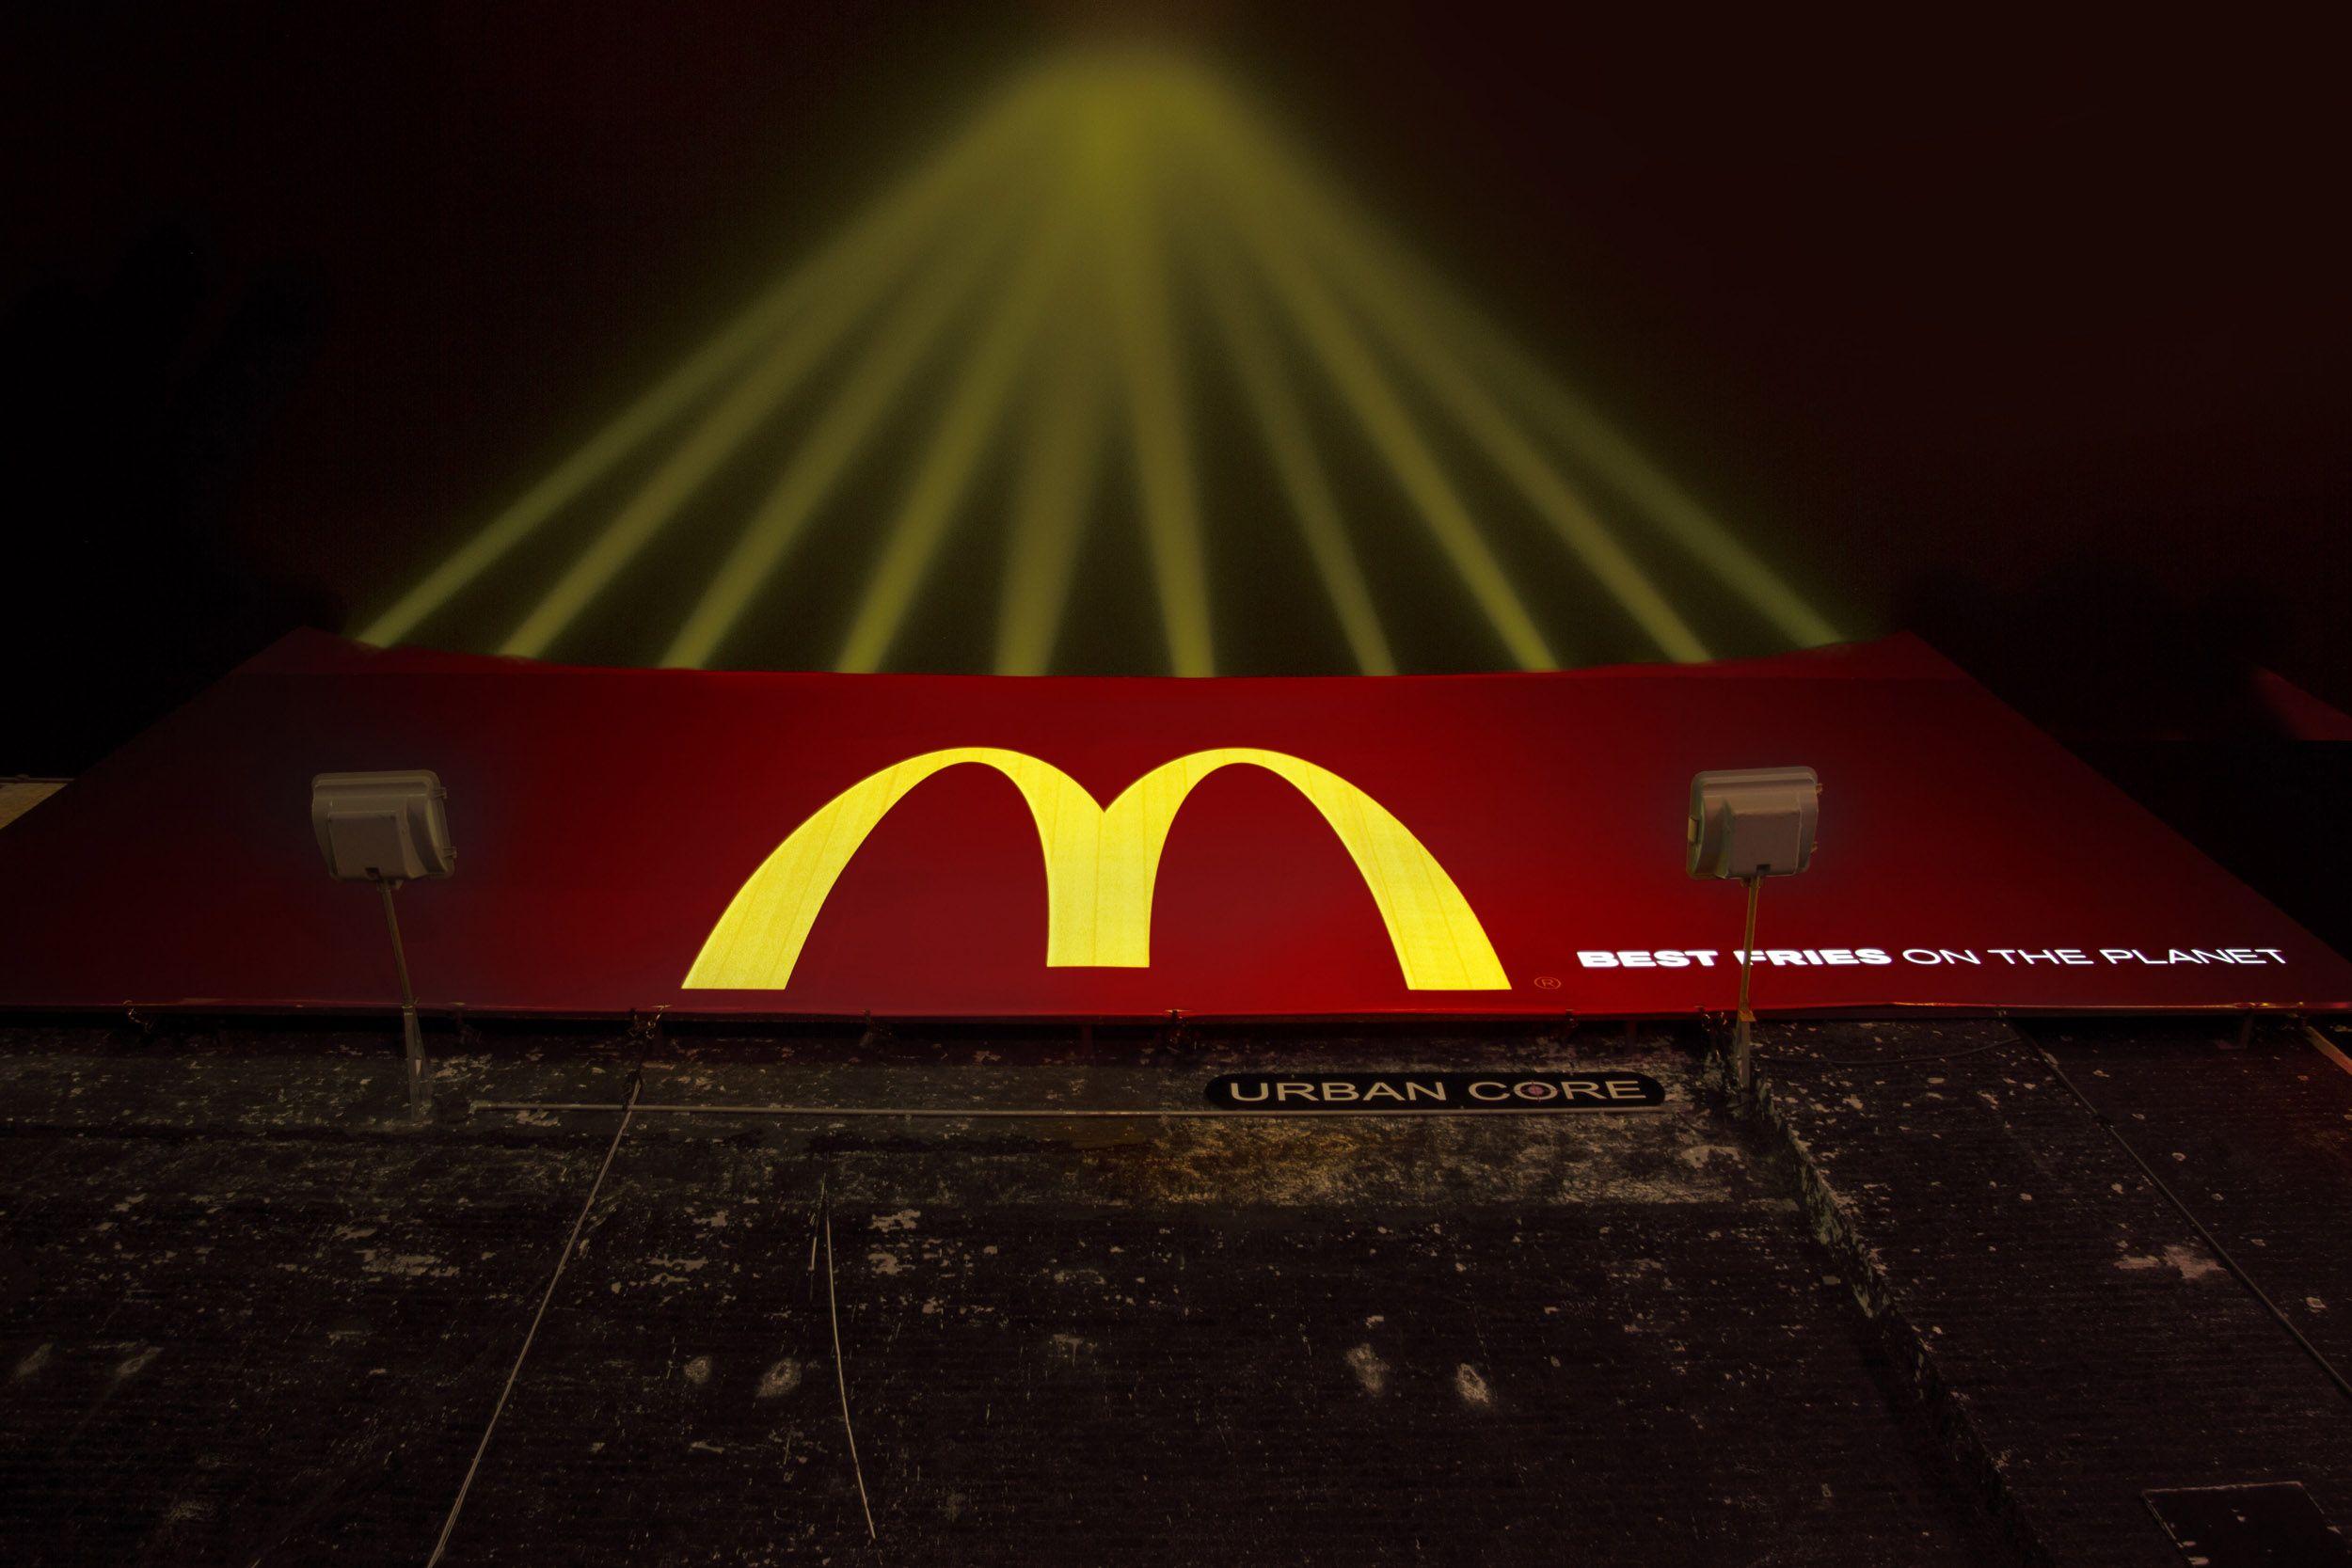 Luci McDonald's